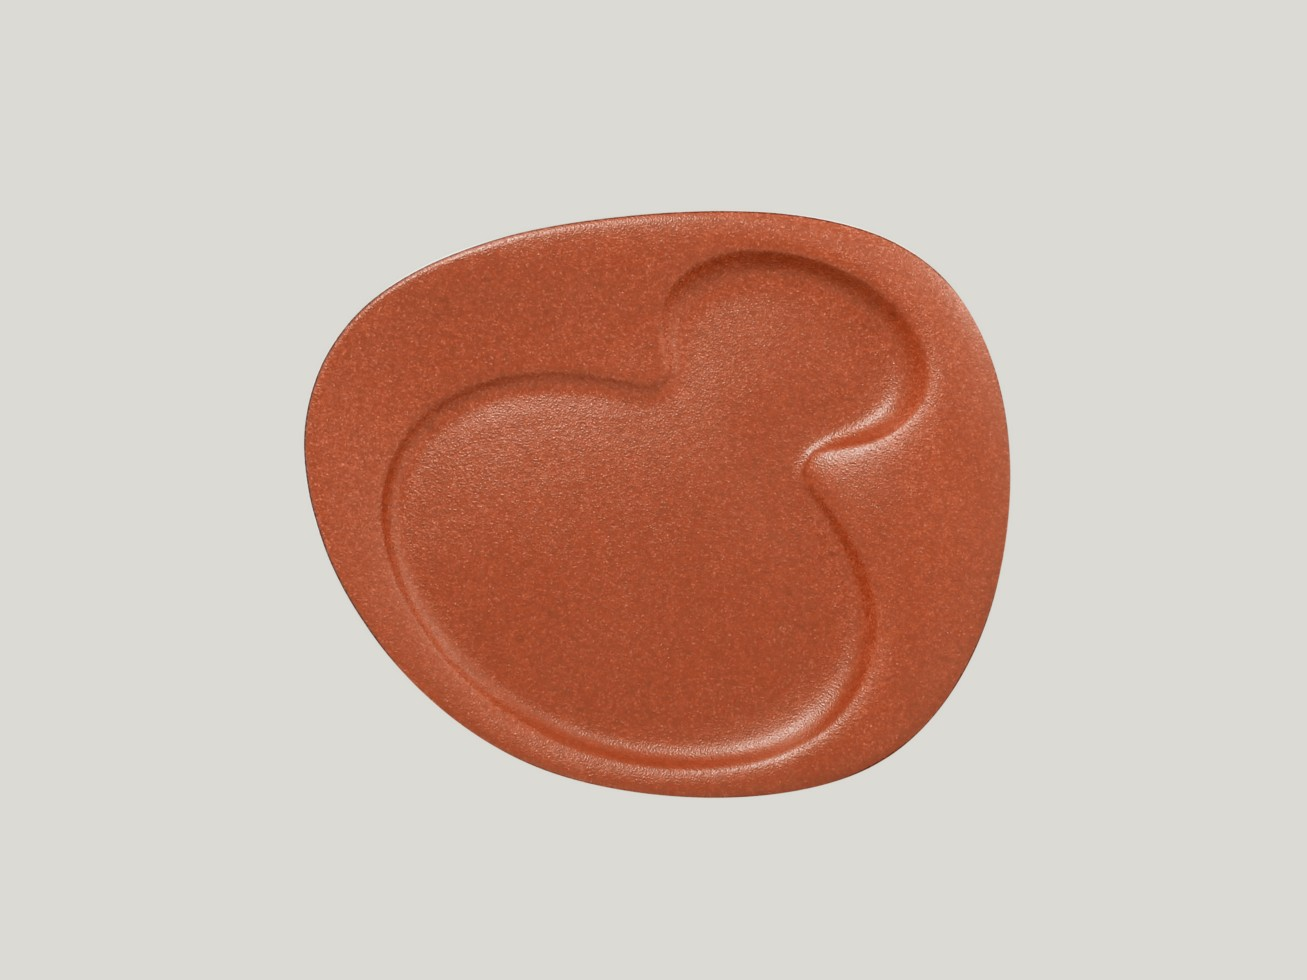 Breakfast talíř - 2 basins - hnědá Neofusion